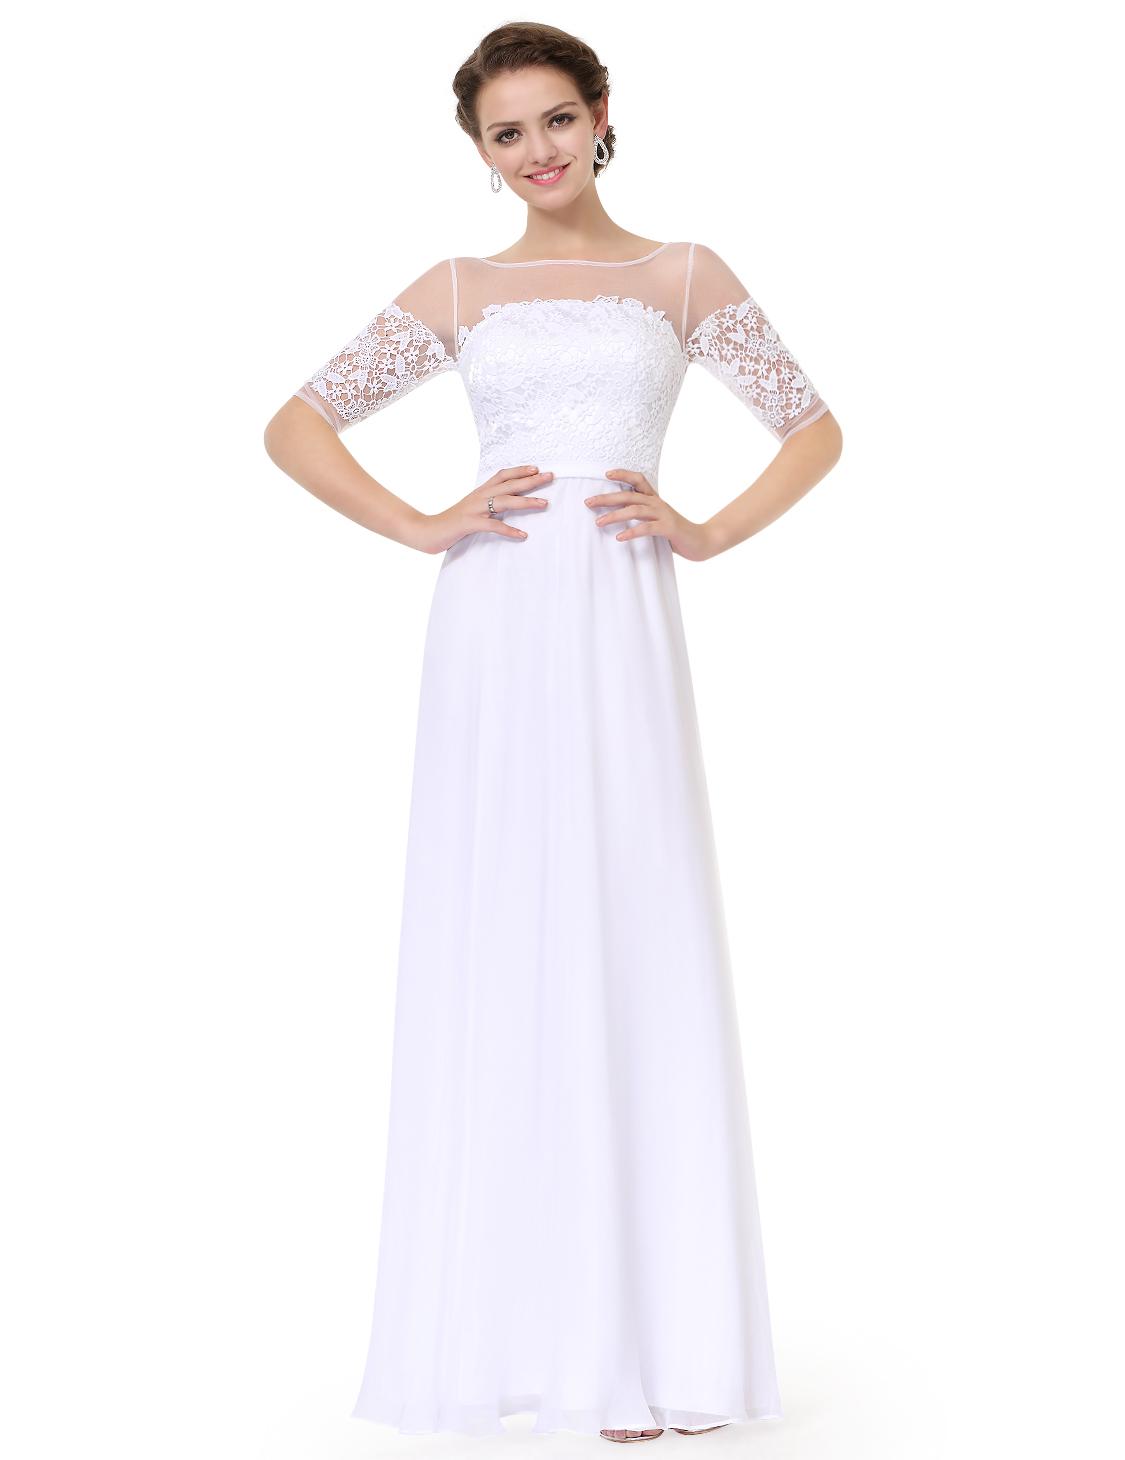 Womens short sleeve bridesmaid dresses formal evening gown 08459 womens short sleeve bridesmaid dresses formal evening gown ombrellifo Gallery